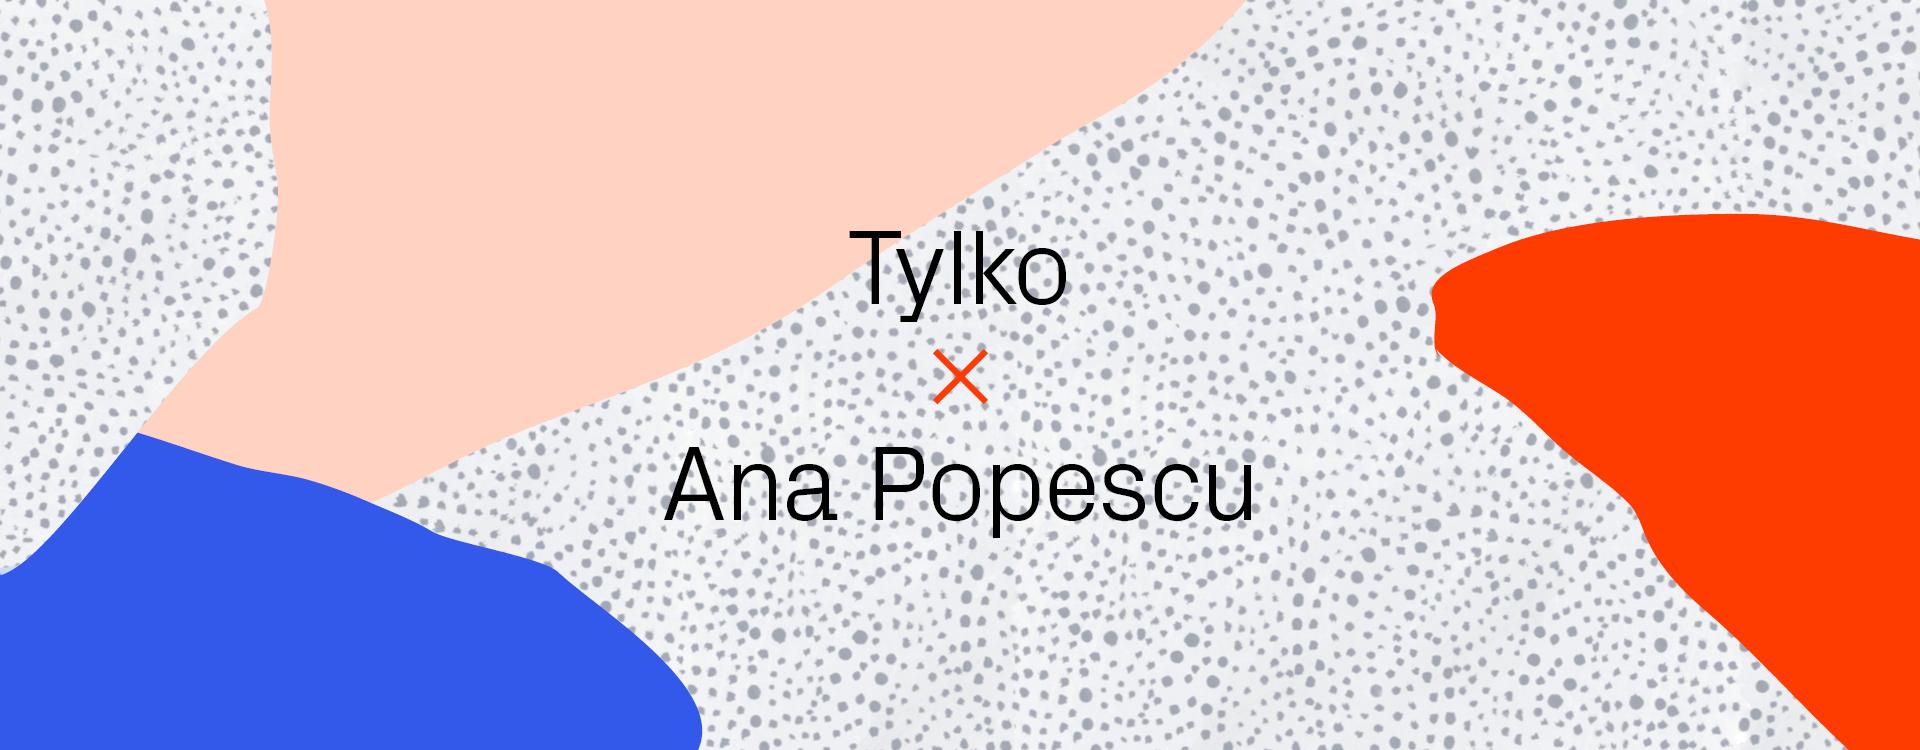 ana popescu artwork